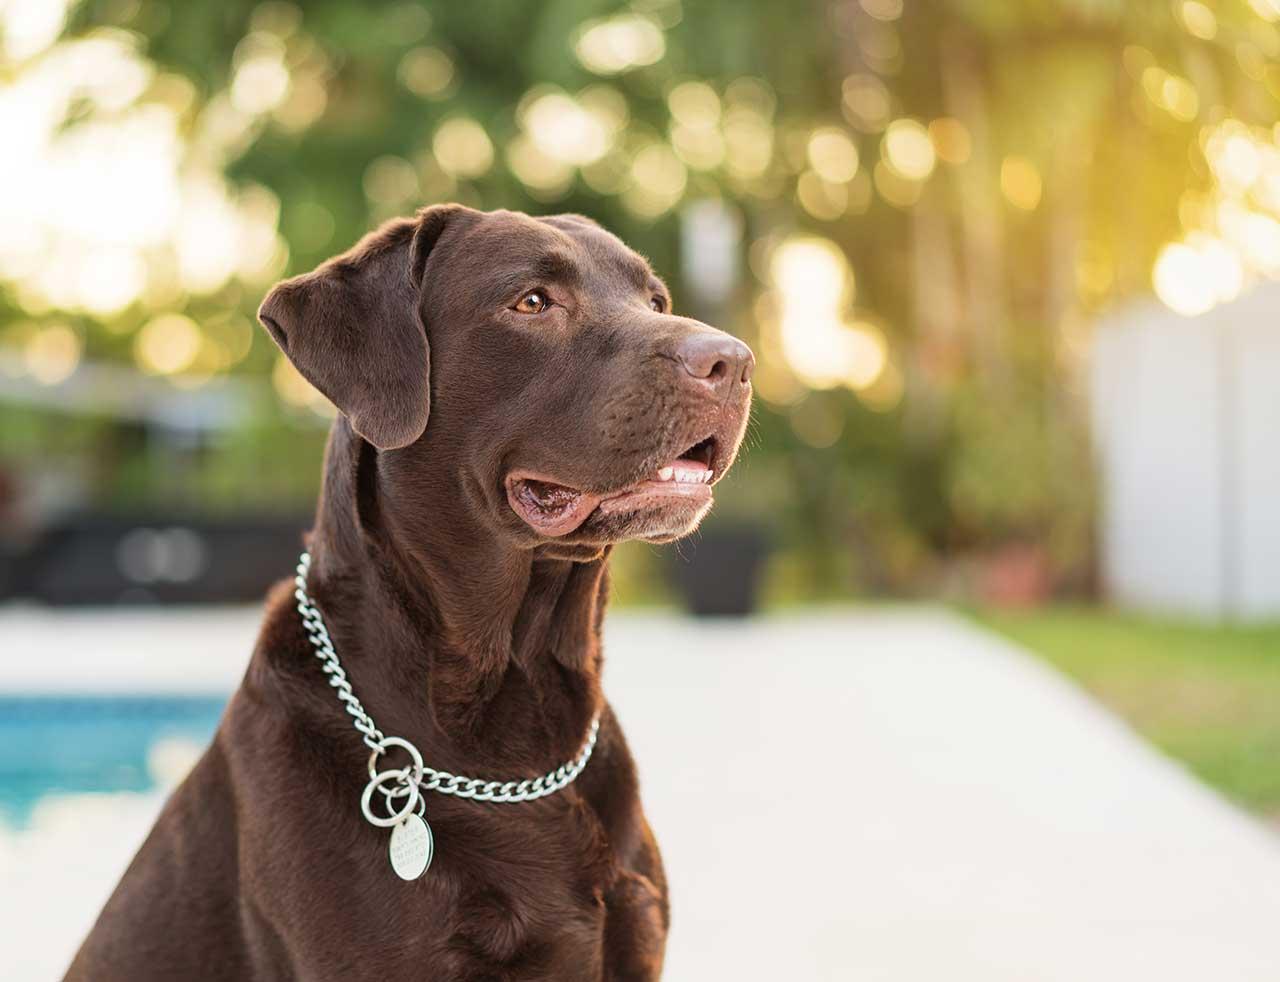 Labrador Retriever Dog Breed » Information, Pictures, & More